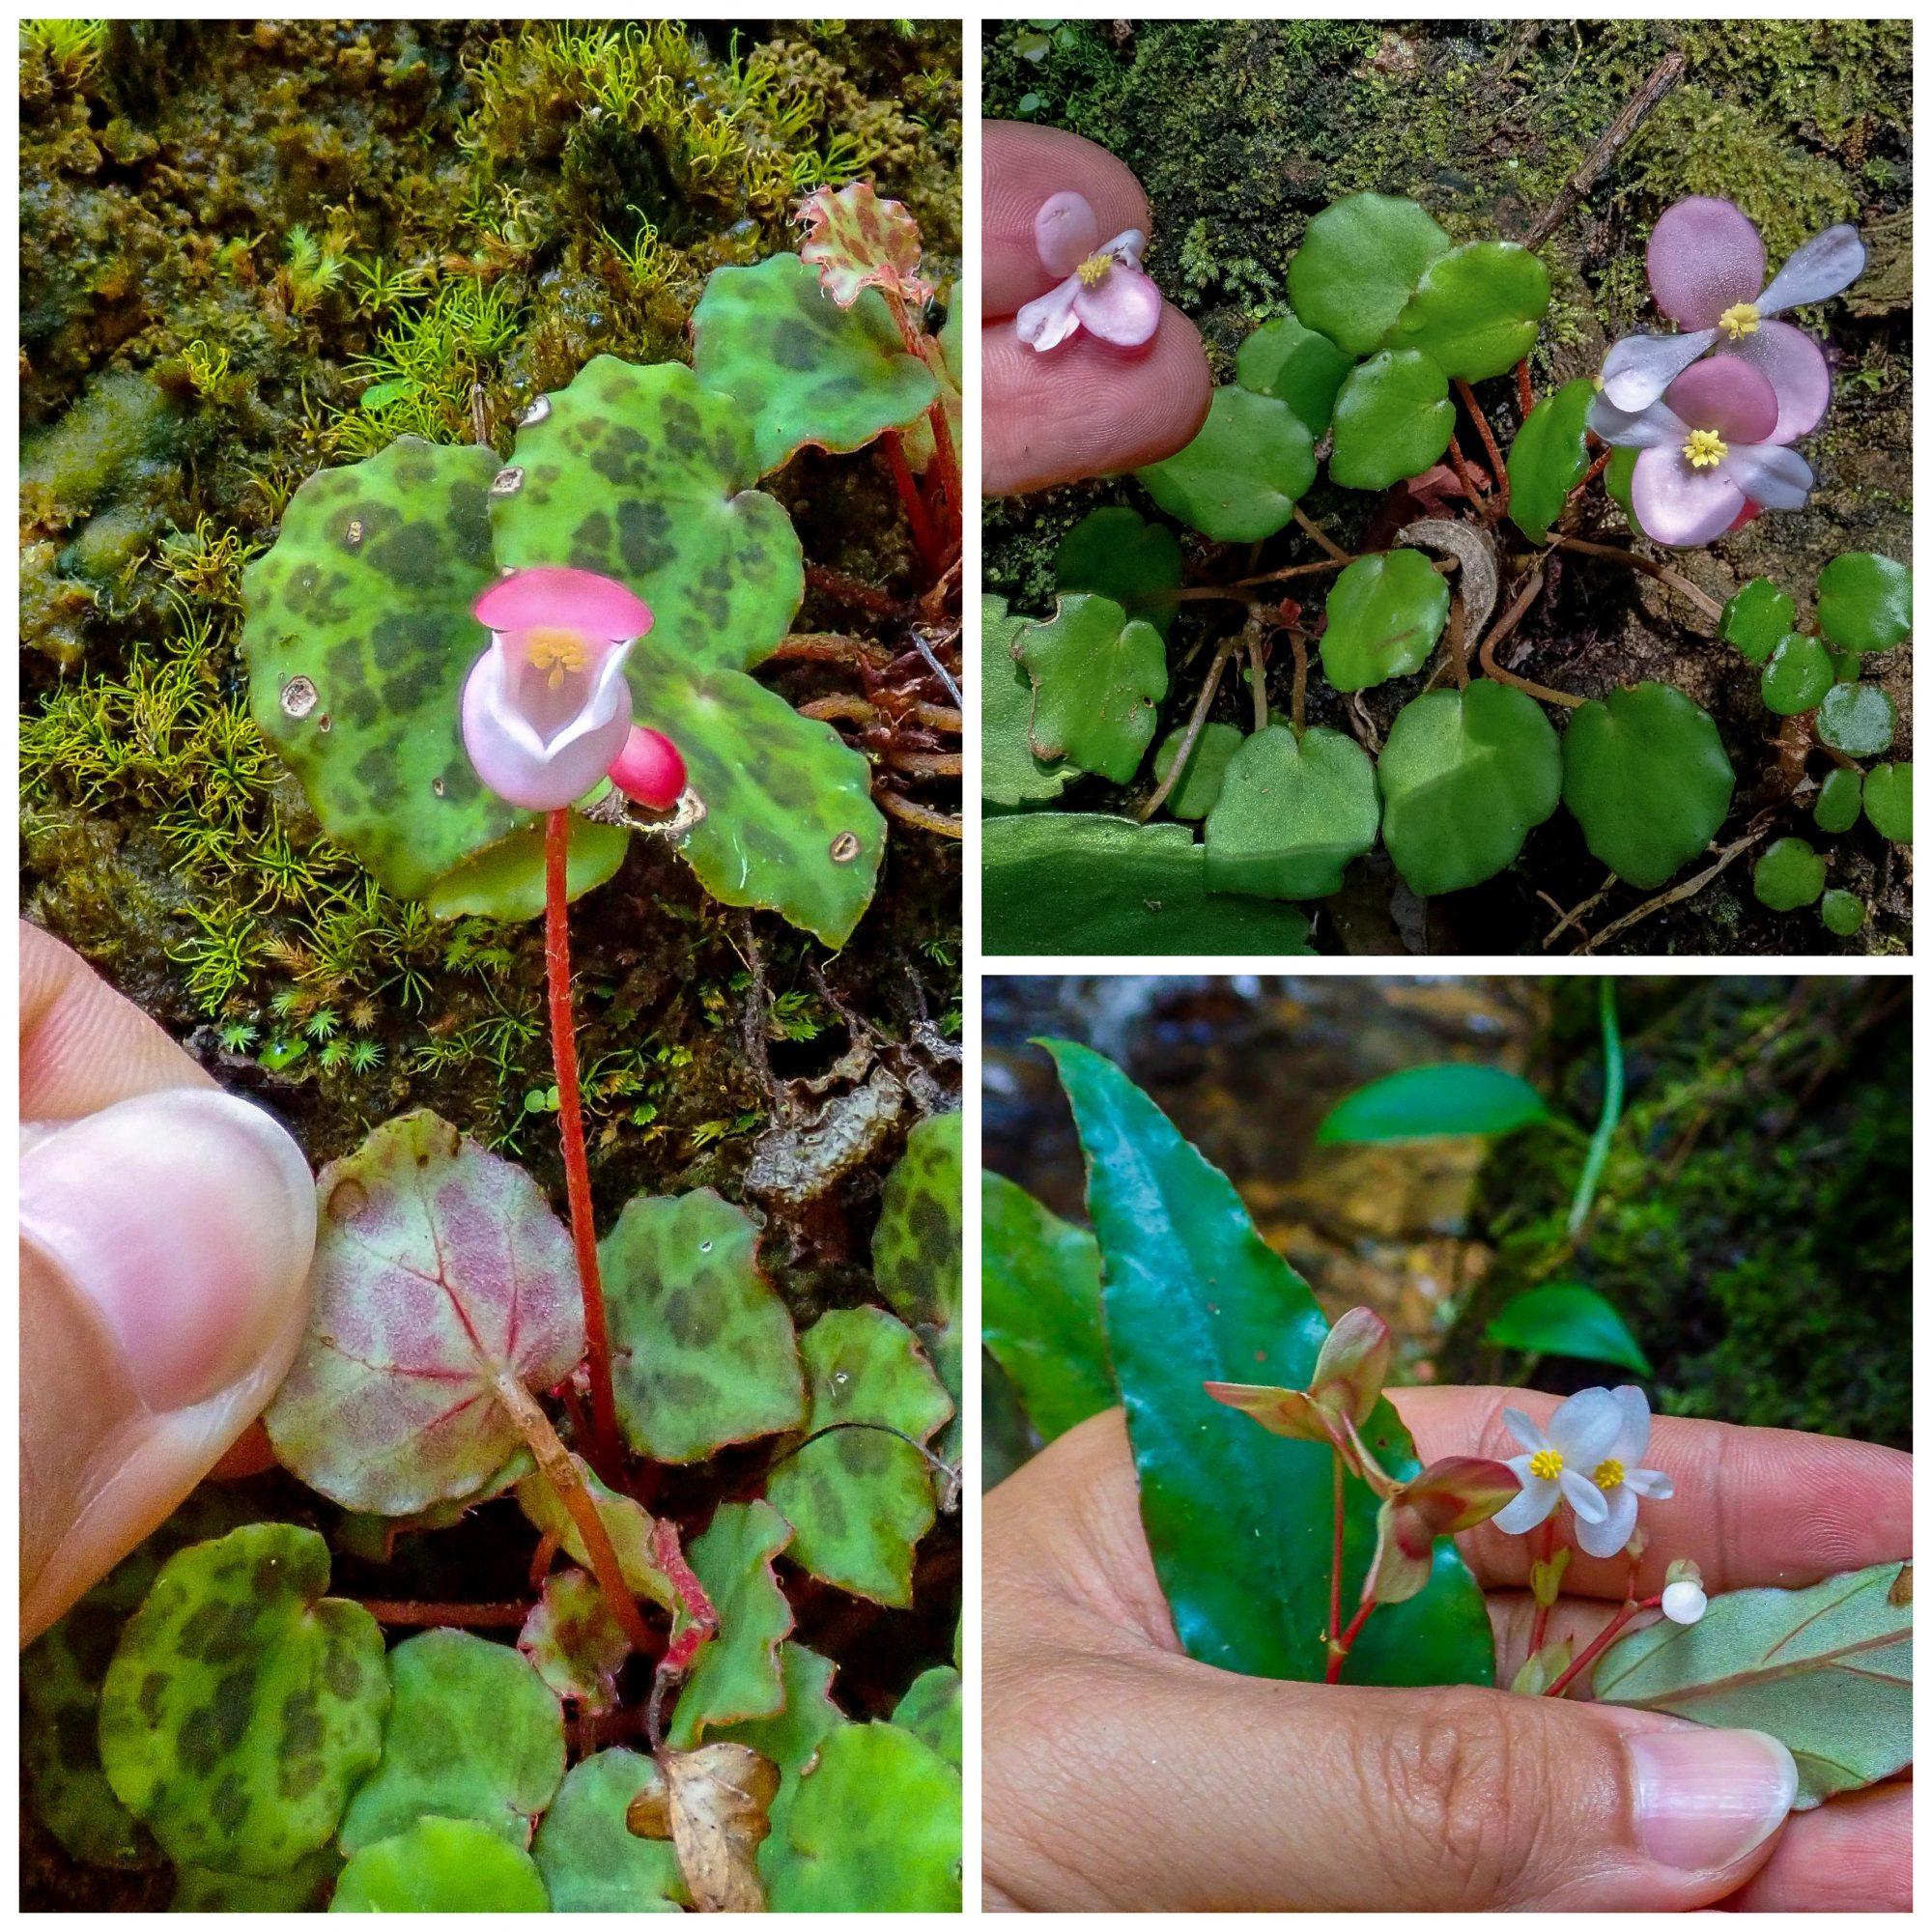 new flora species